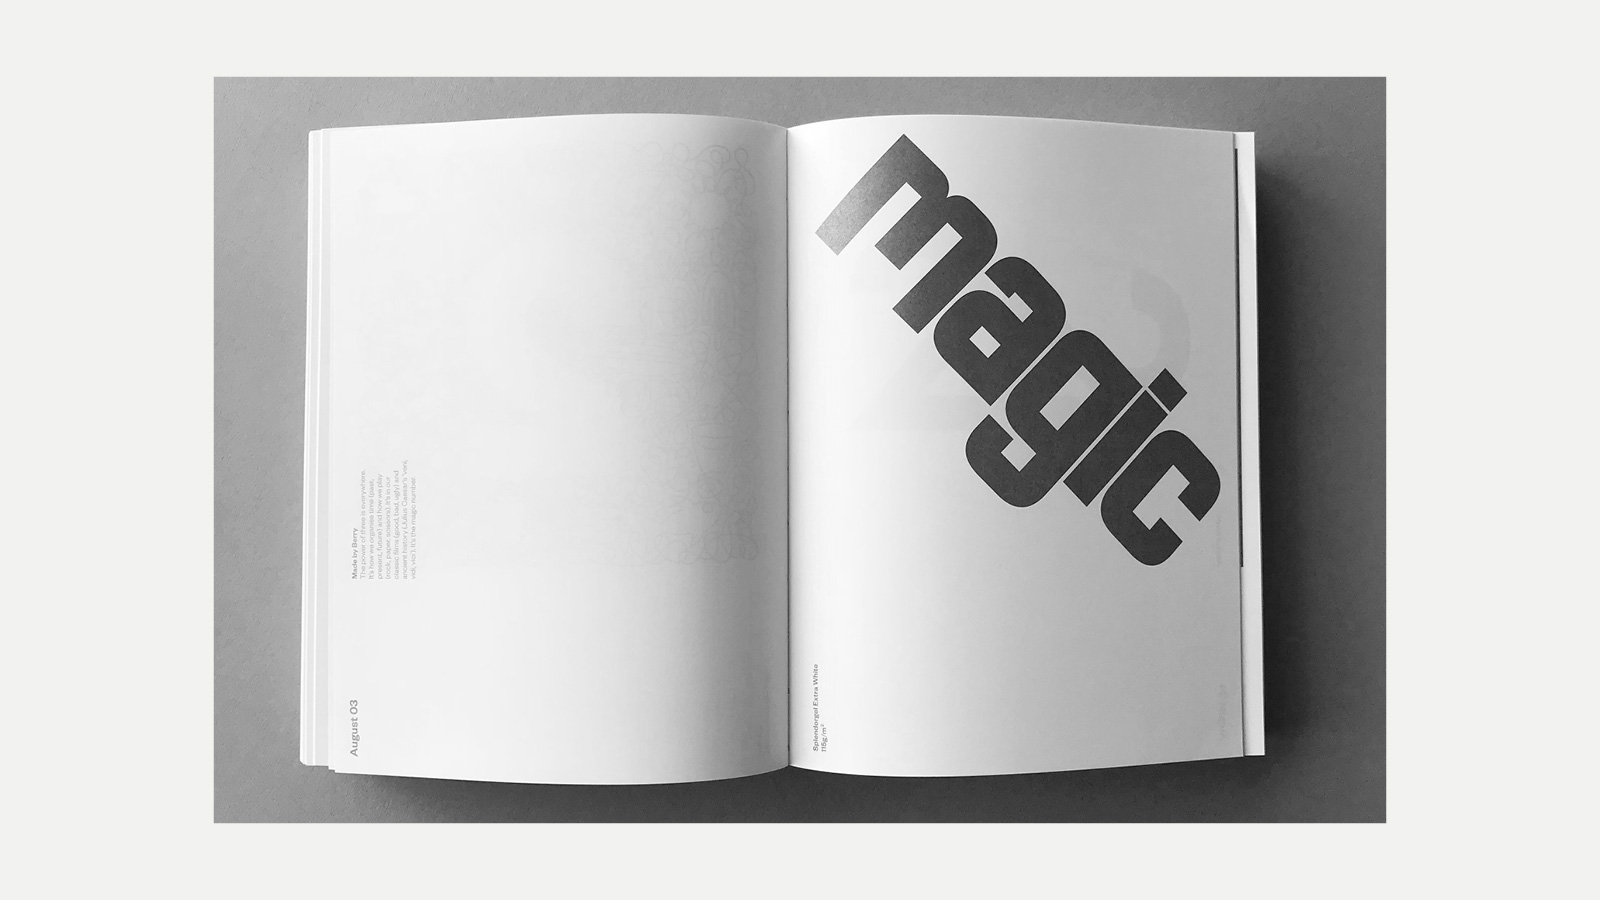 typography-graphics-print-design-fedrigoni-paper-magic-madebyberry-berry-2